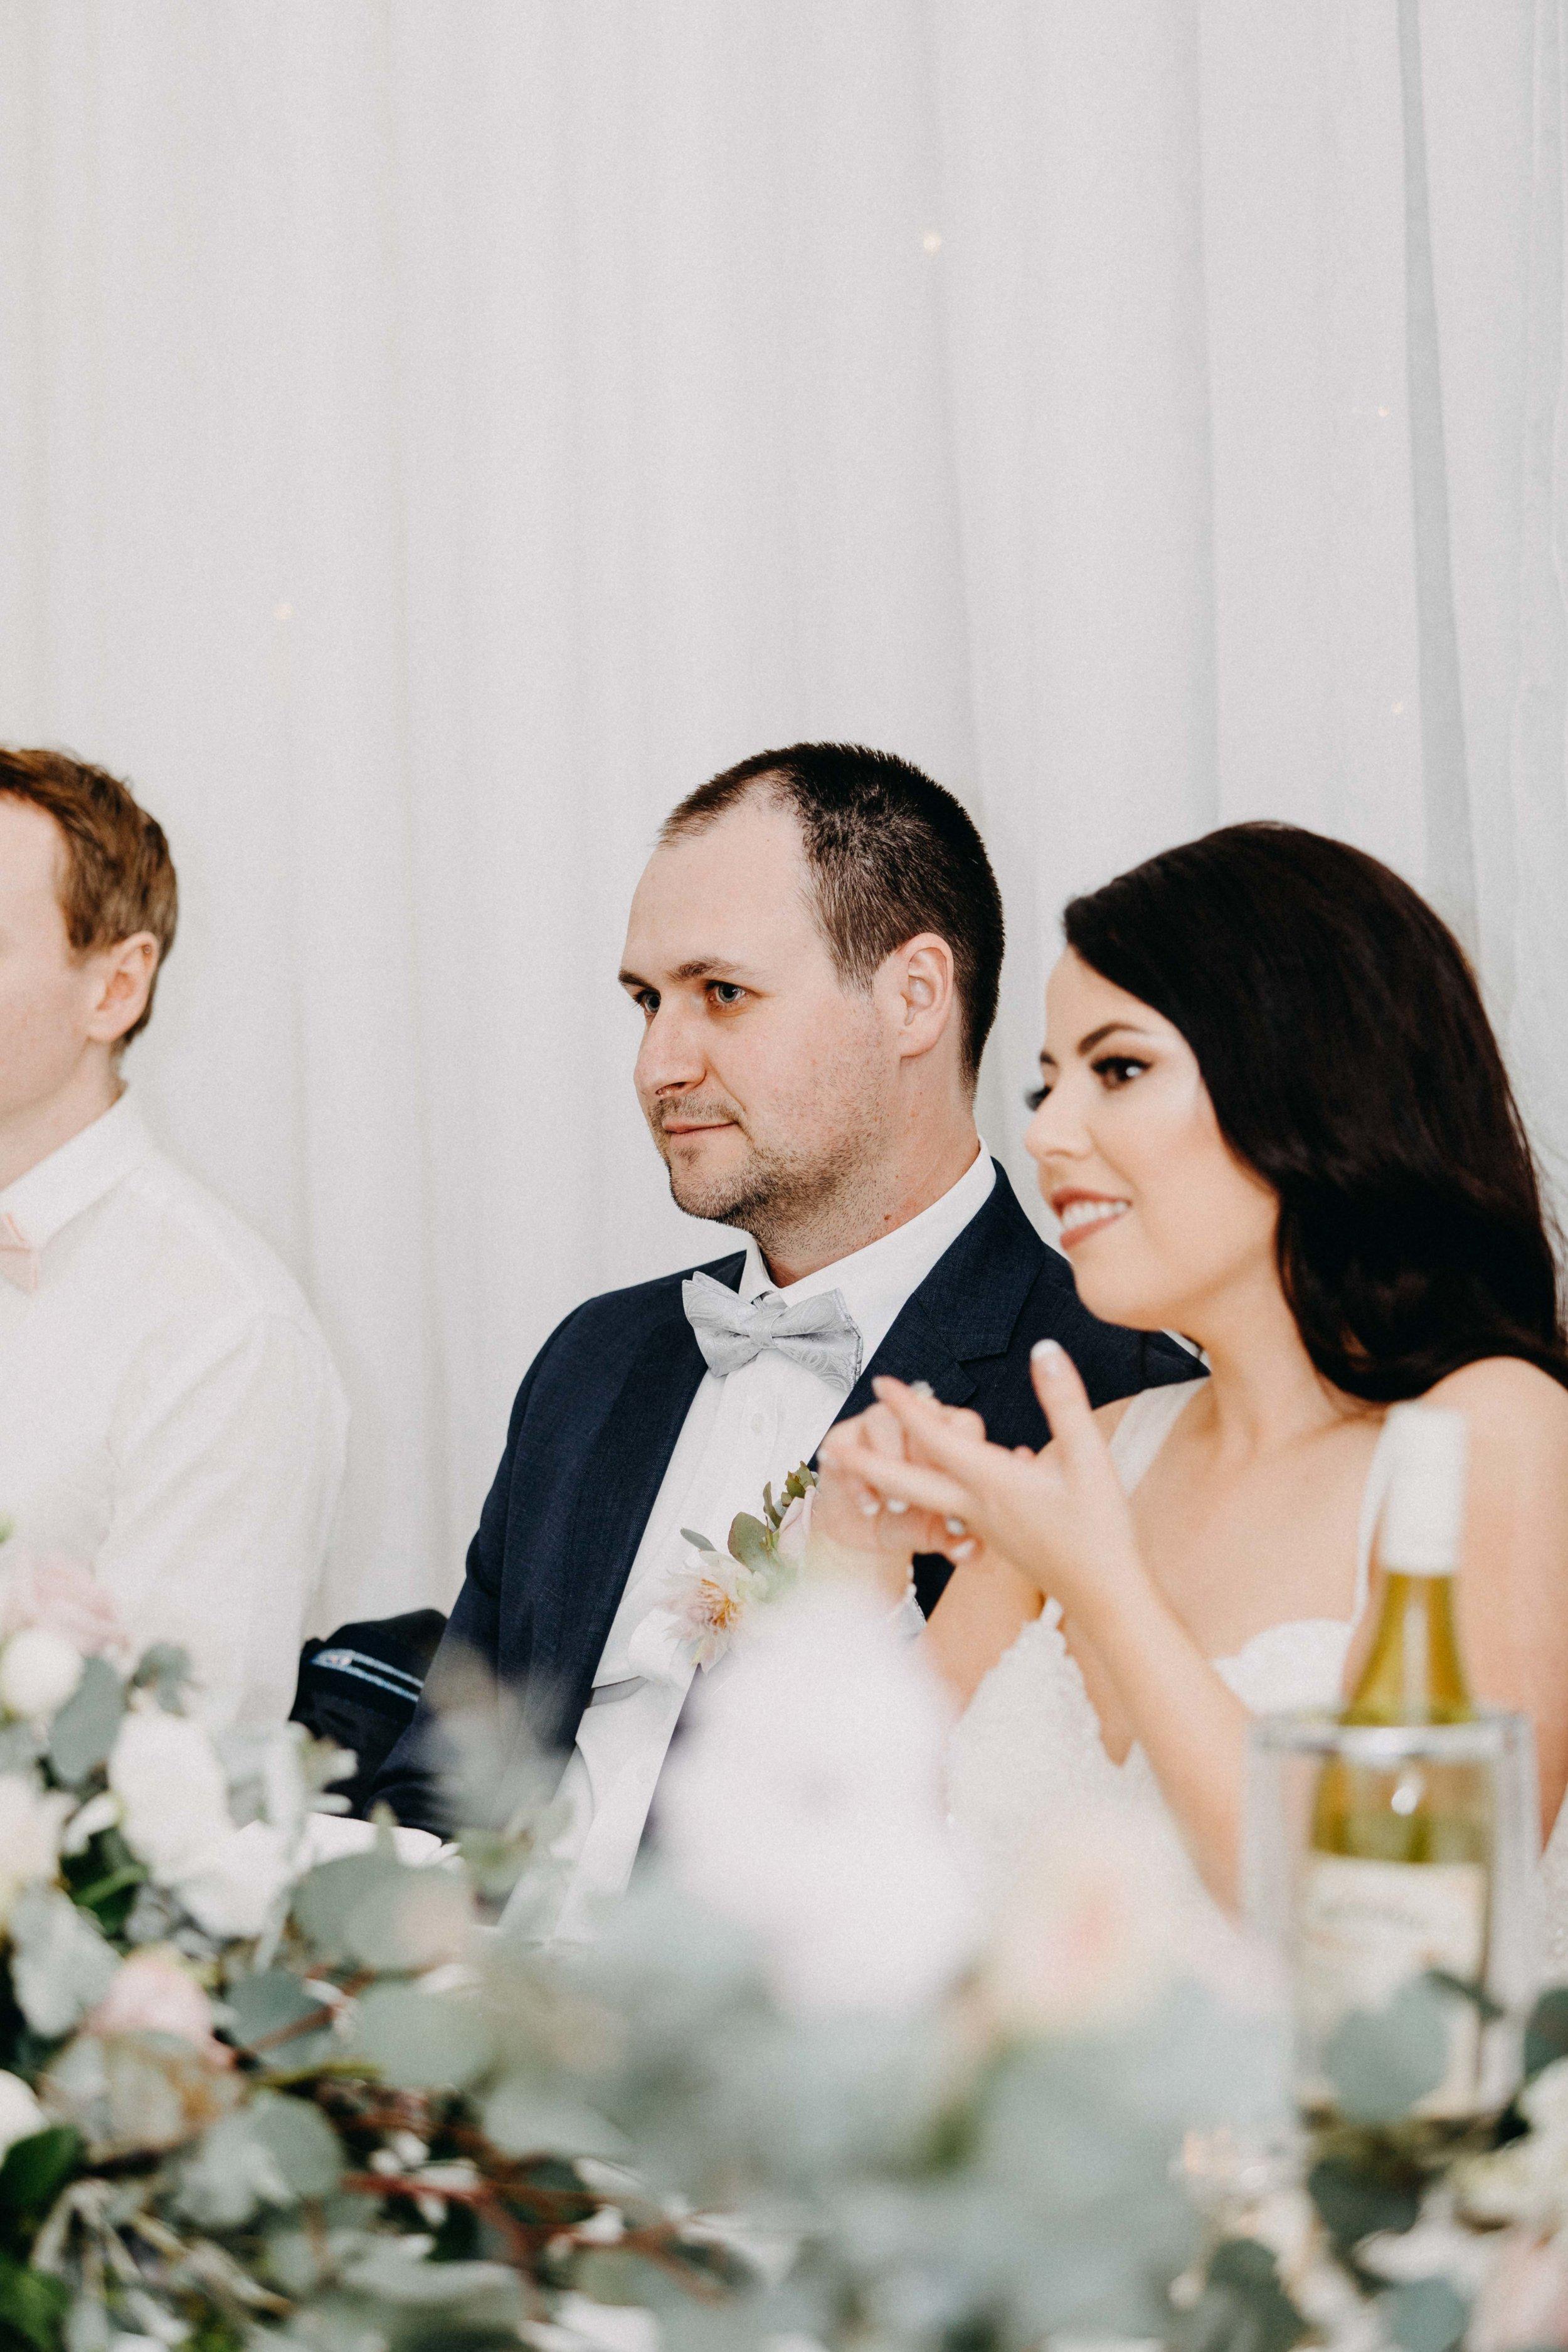 exeter-southern-highlands-wedding-www.emilyobrienphotography.net -133.jpg